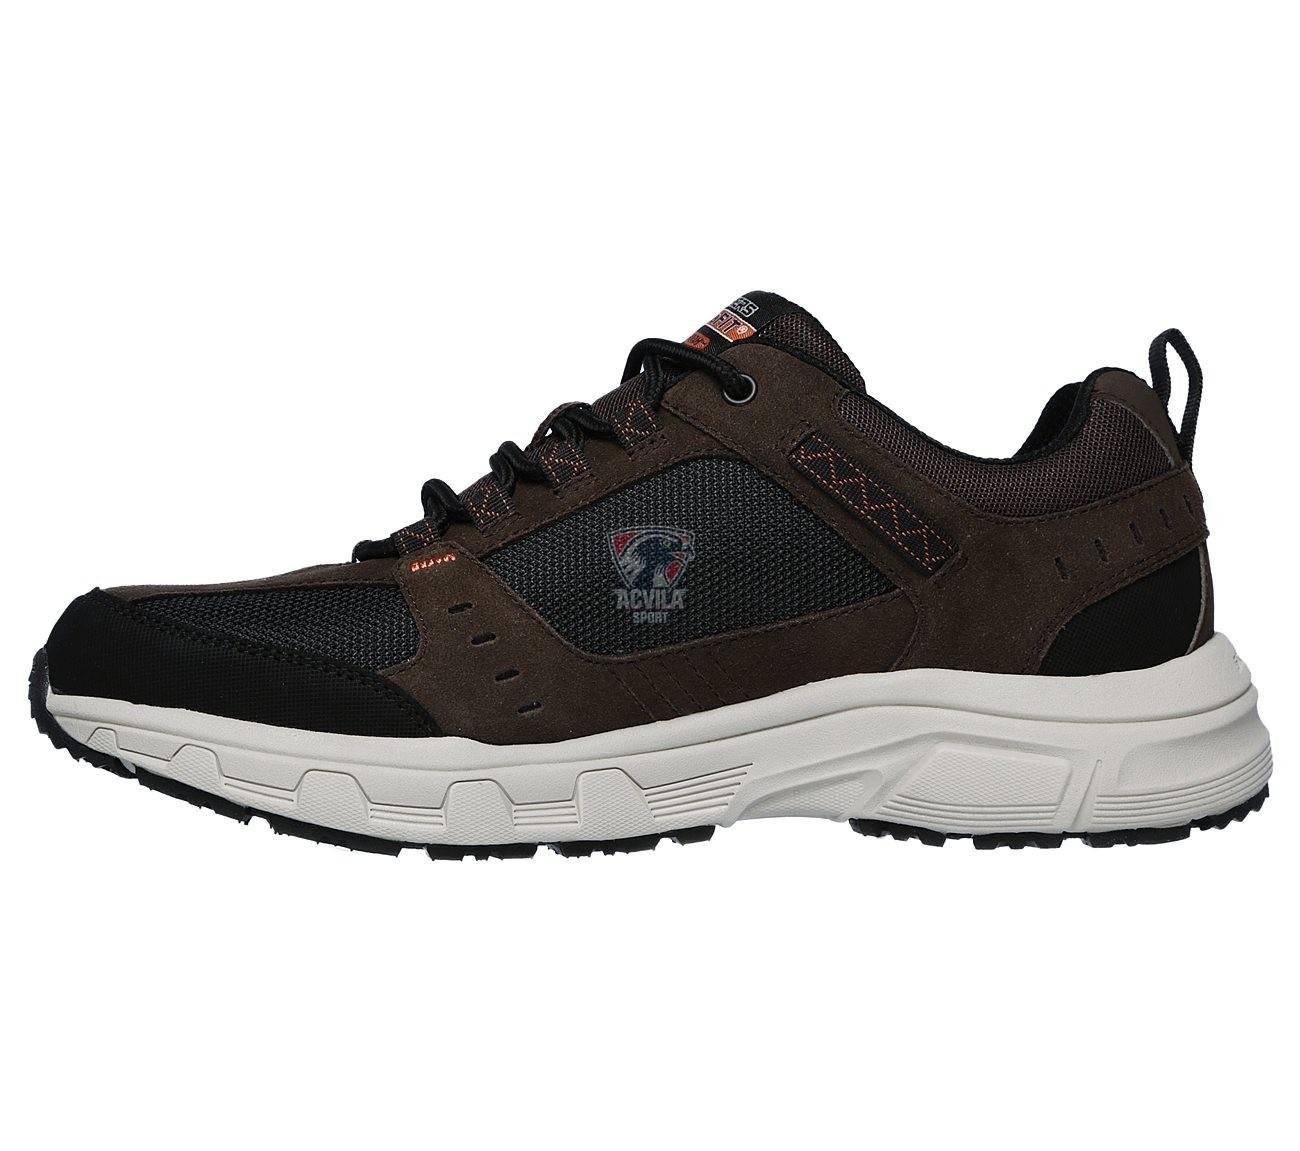 photo 2 Спортивная обувь SKCHERS OAK CANYON